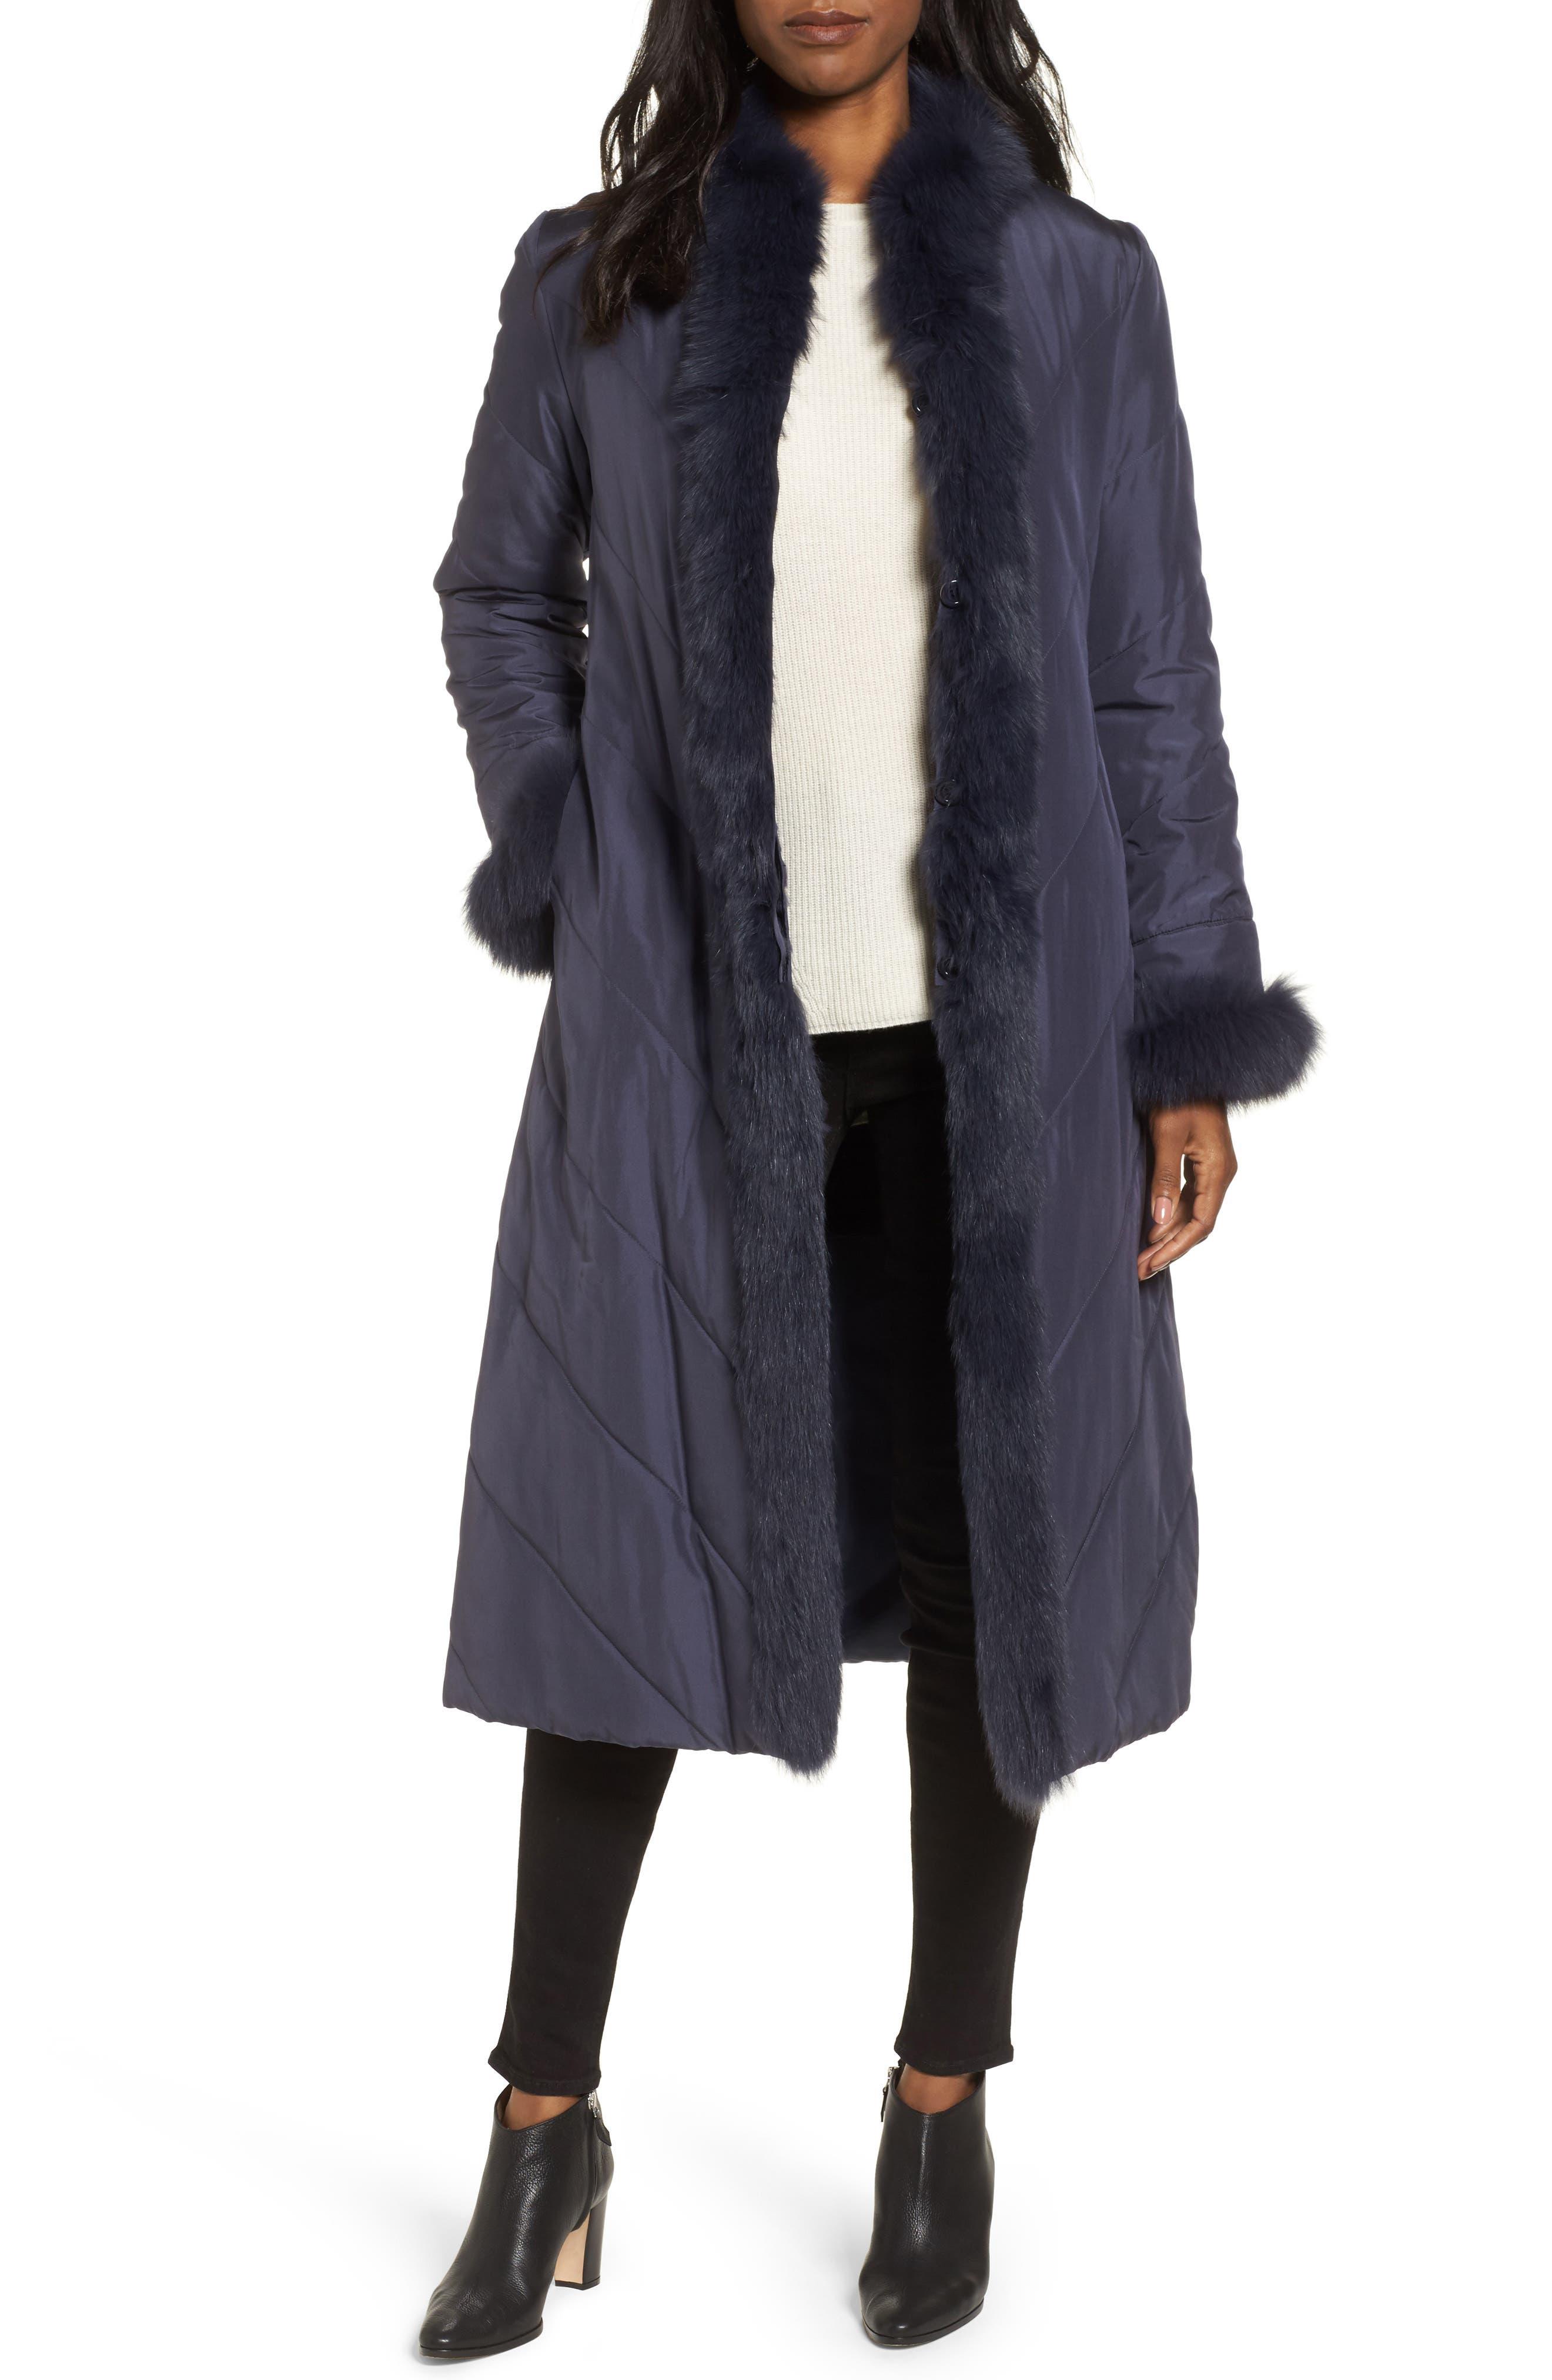 Main Image - George Simonton Couture Packable Silk Coat with Genuine Fox Fur & Genuine Rabbit Fur